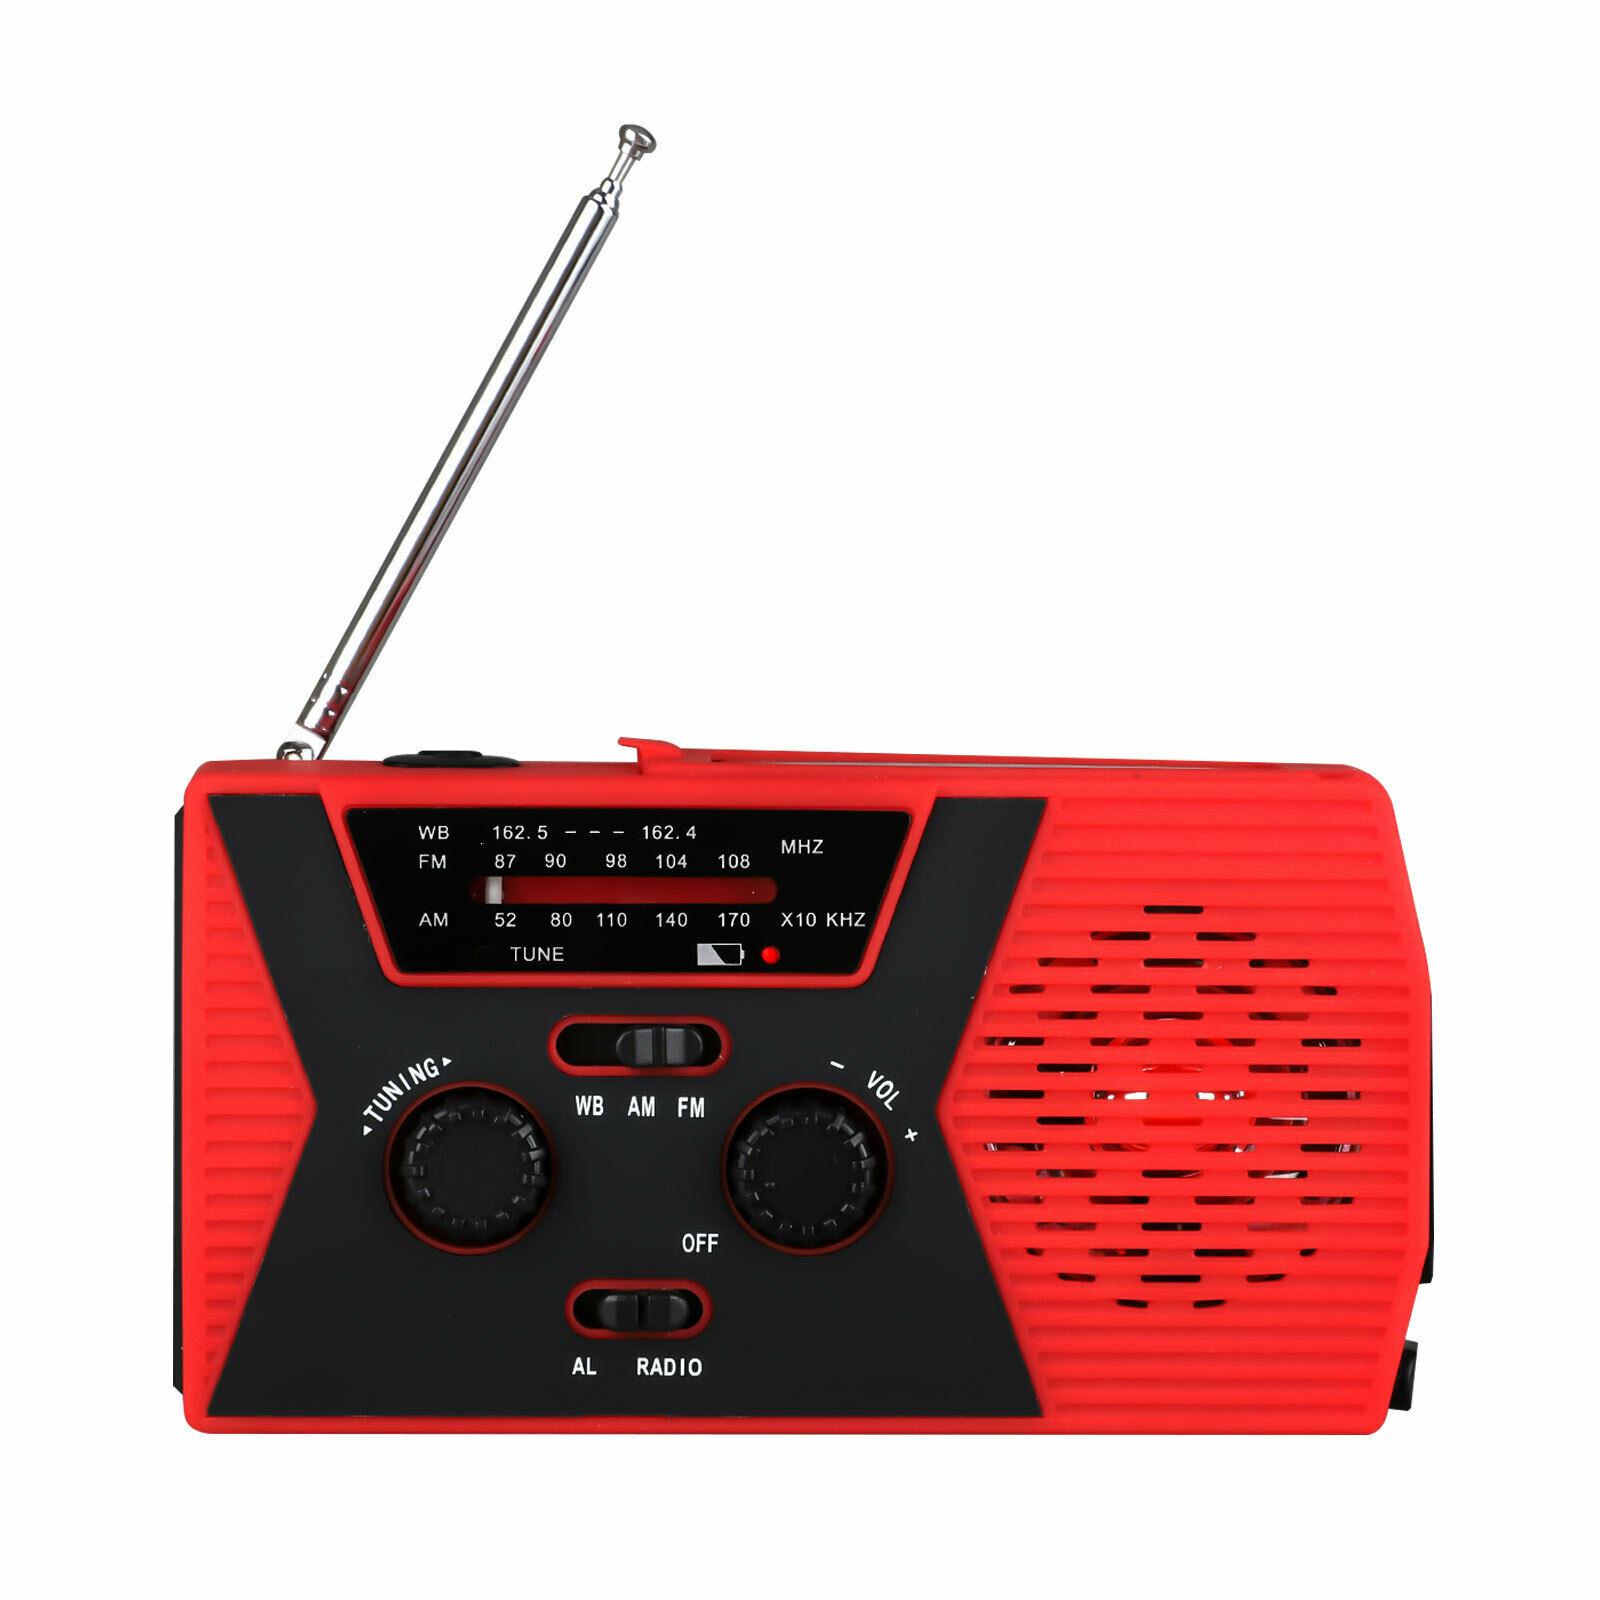 Emergency Solar Crank Radio Charging NOAA Radio with Flashlight Reading Light AM / FM / NOAA red